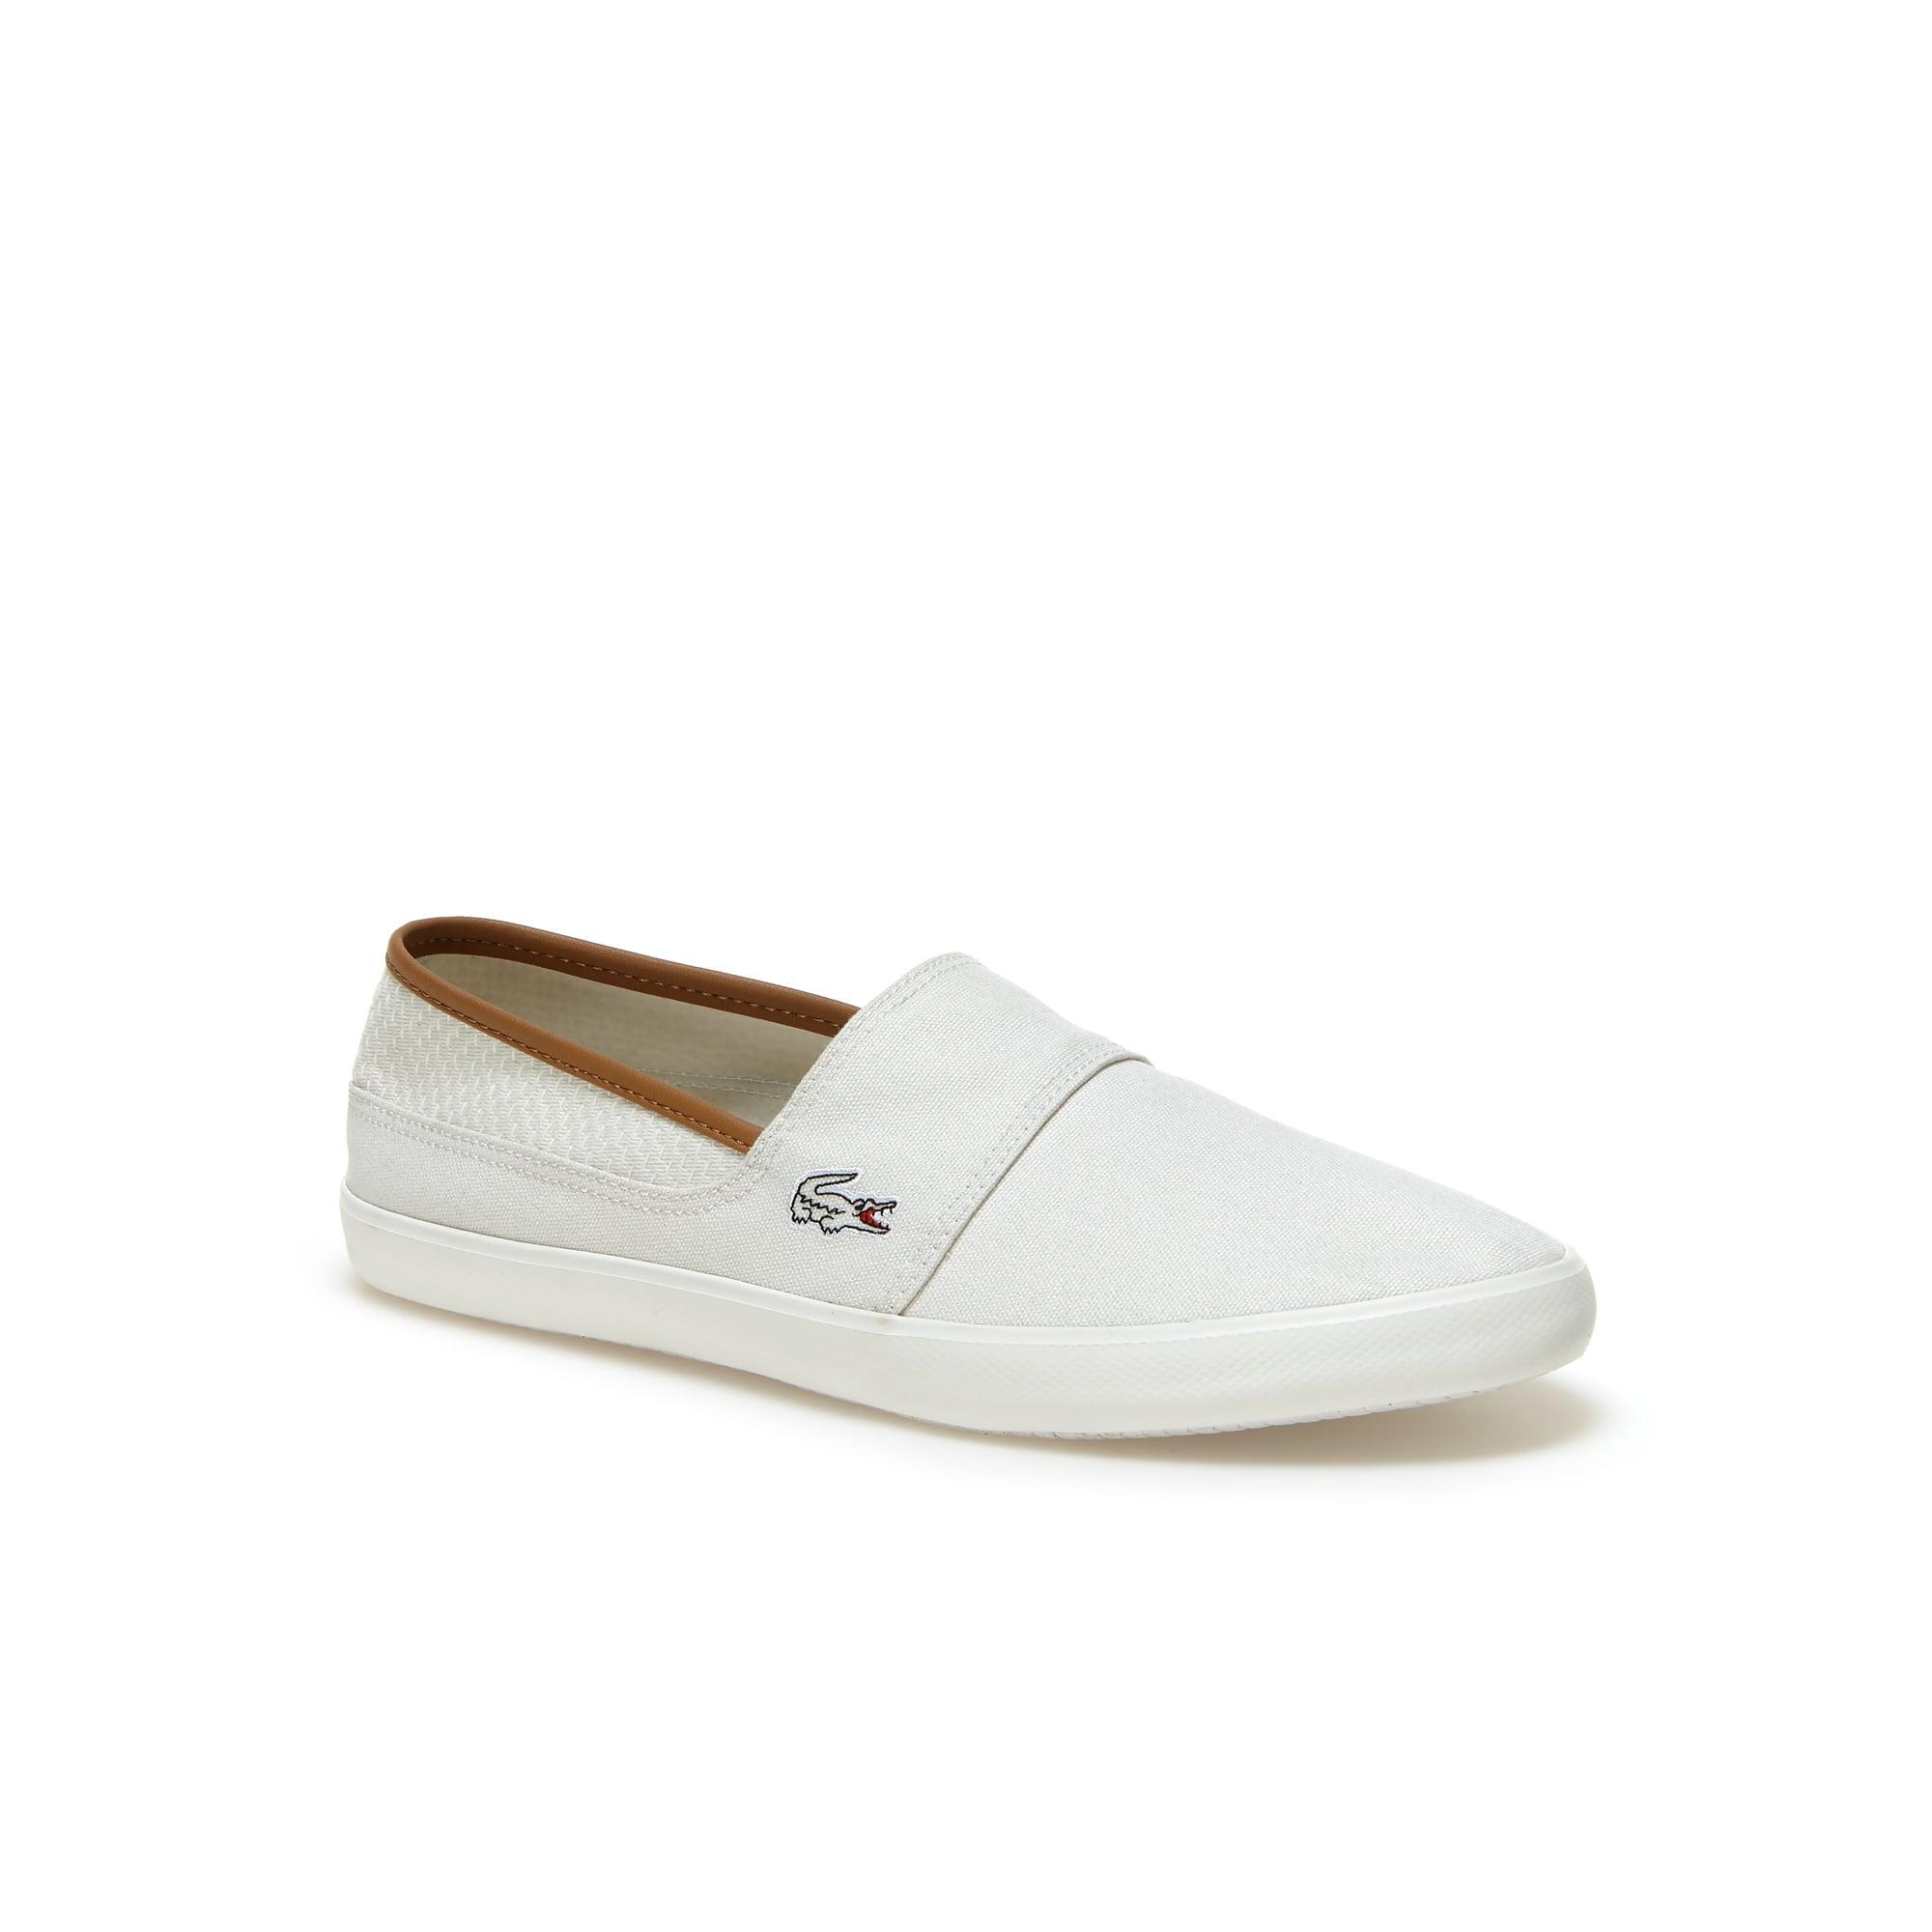 Sneakers senza stringhe Marice in tela premium